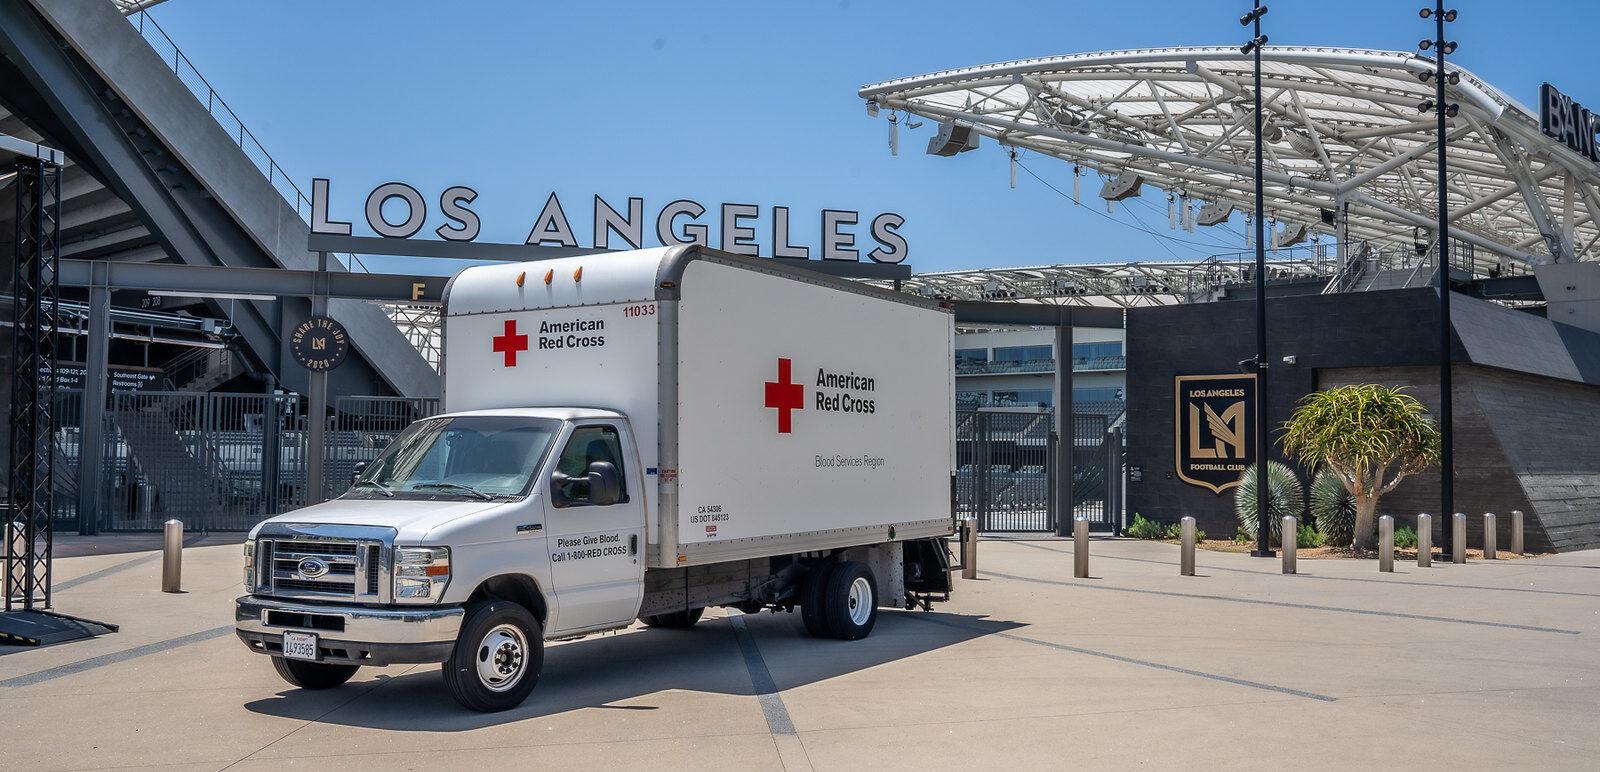 About - Red Cross LA truck